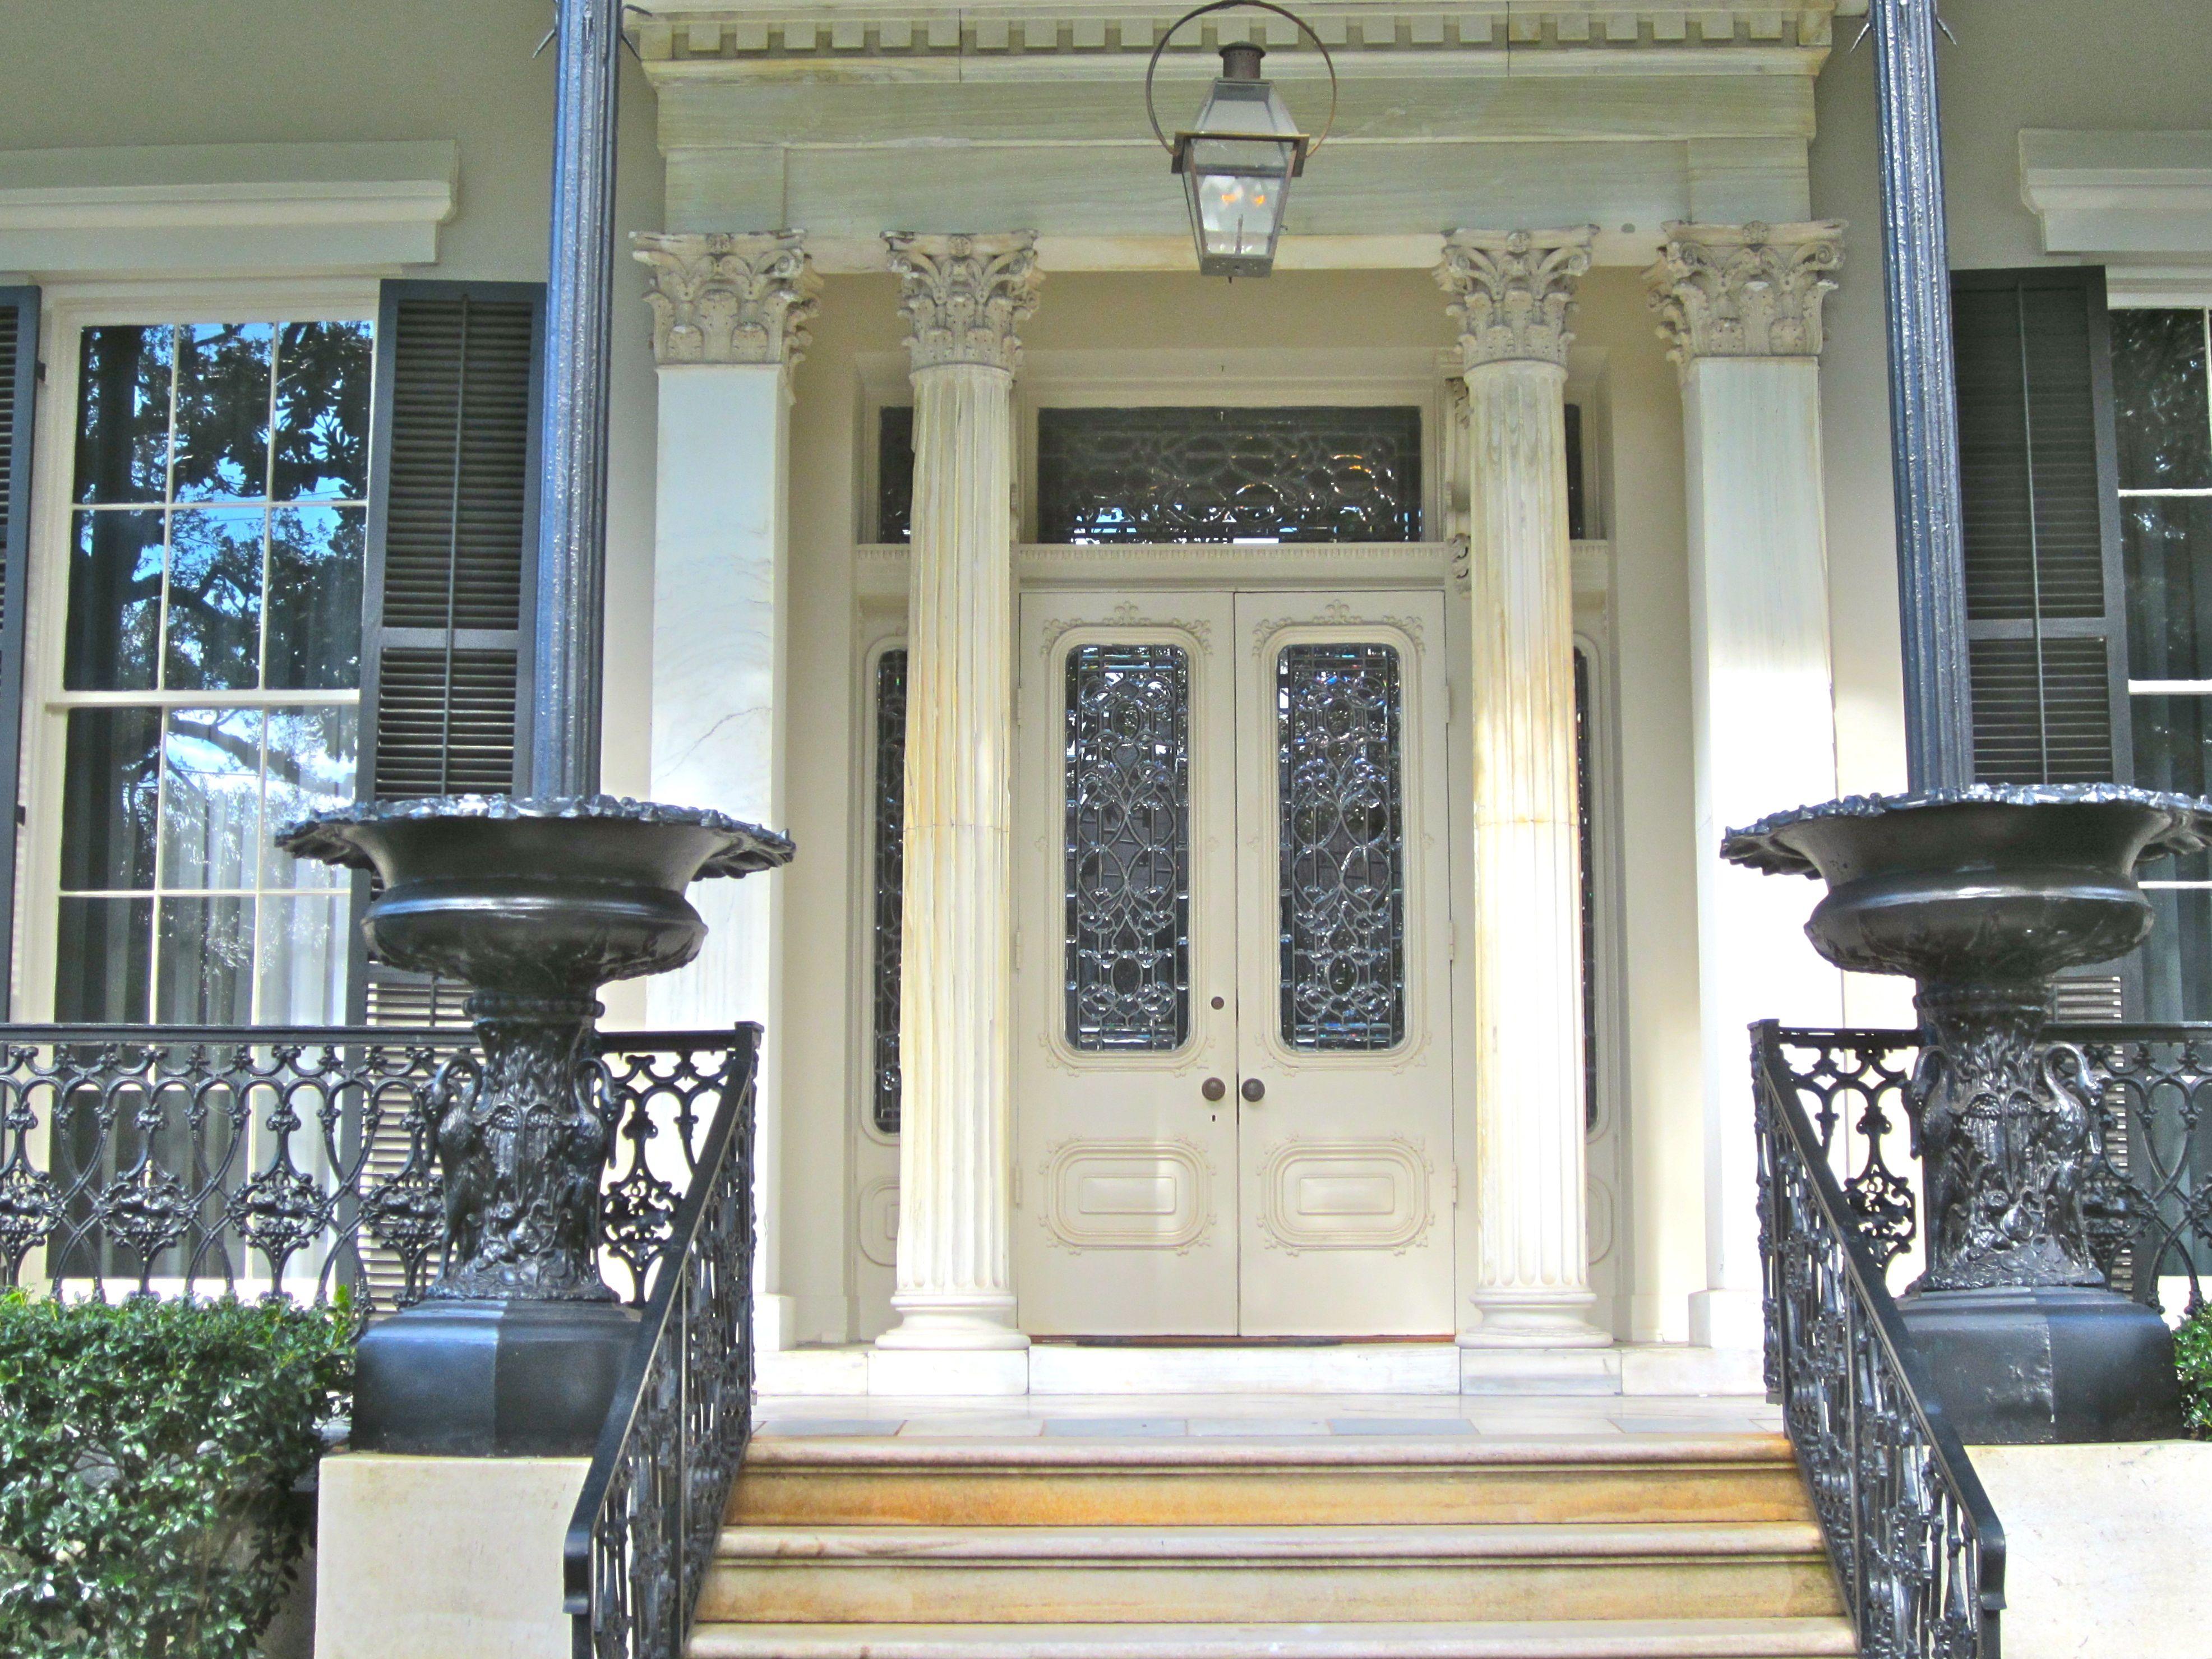 Grand entrance gallivance for Grand entrances